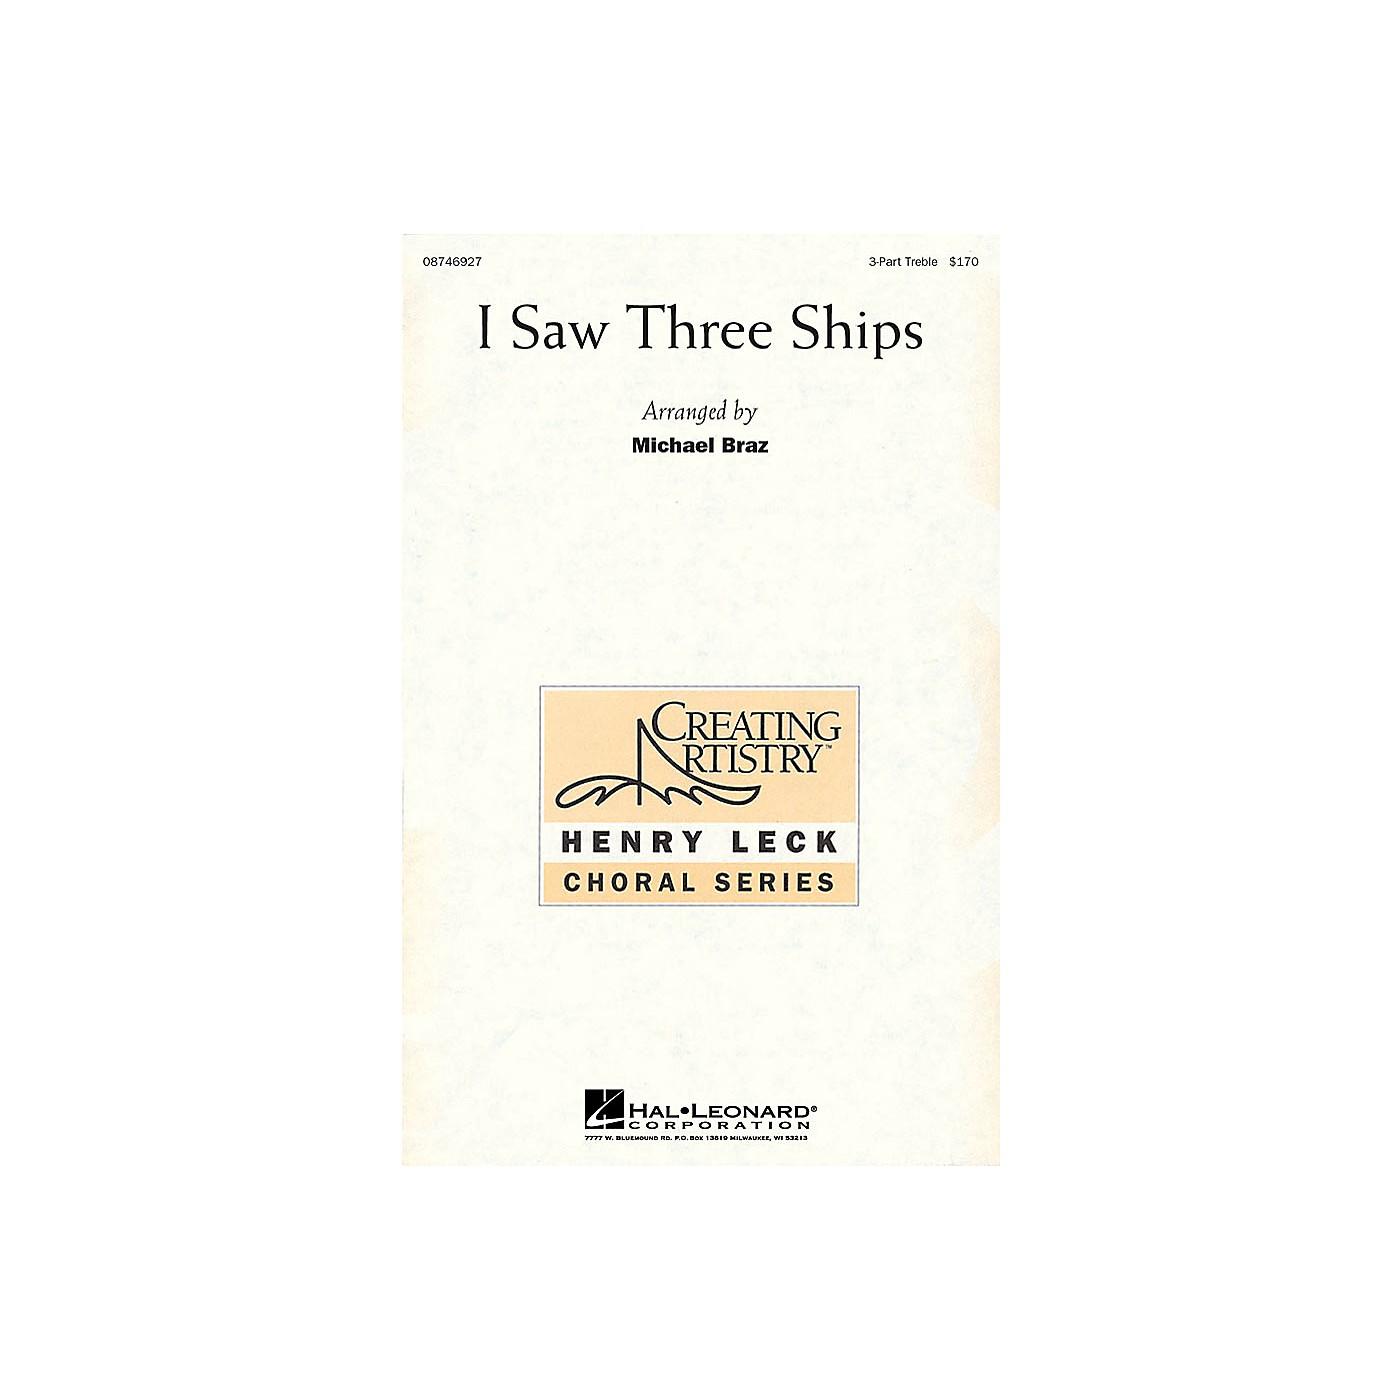 Hal Leonard I Saw Three Ships 3 Part Treble arranged by Michael Braz thumbnail